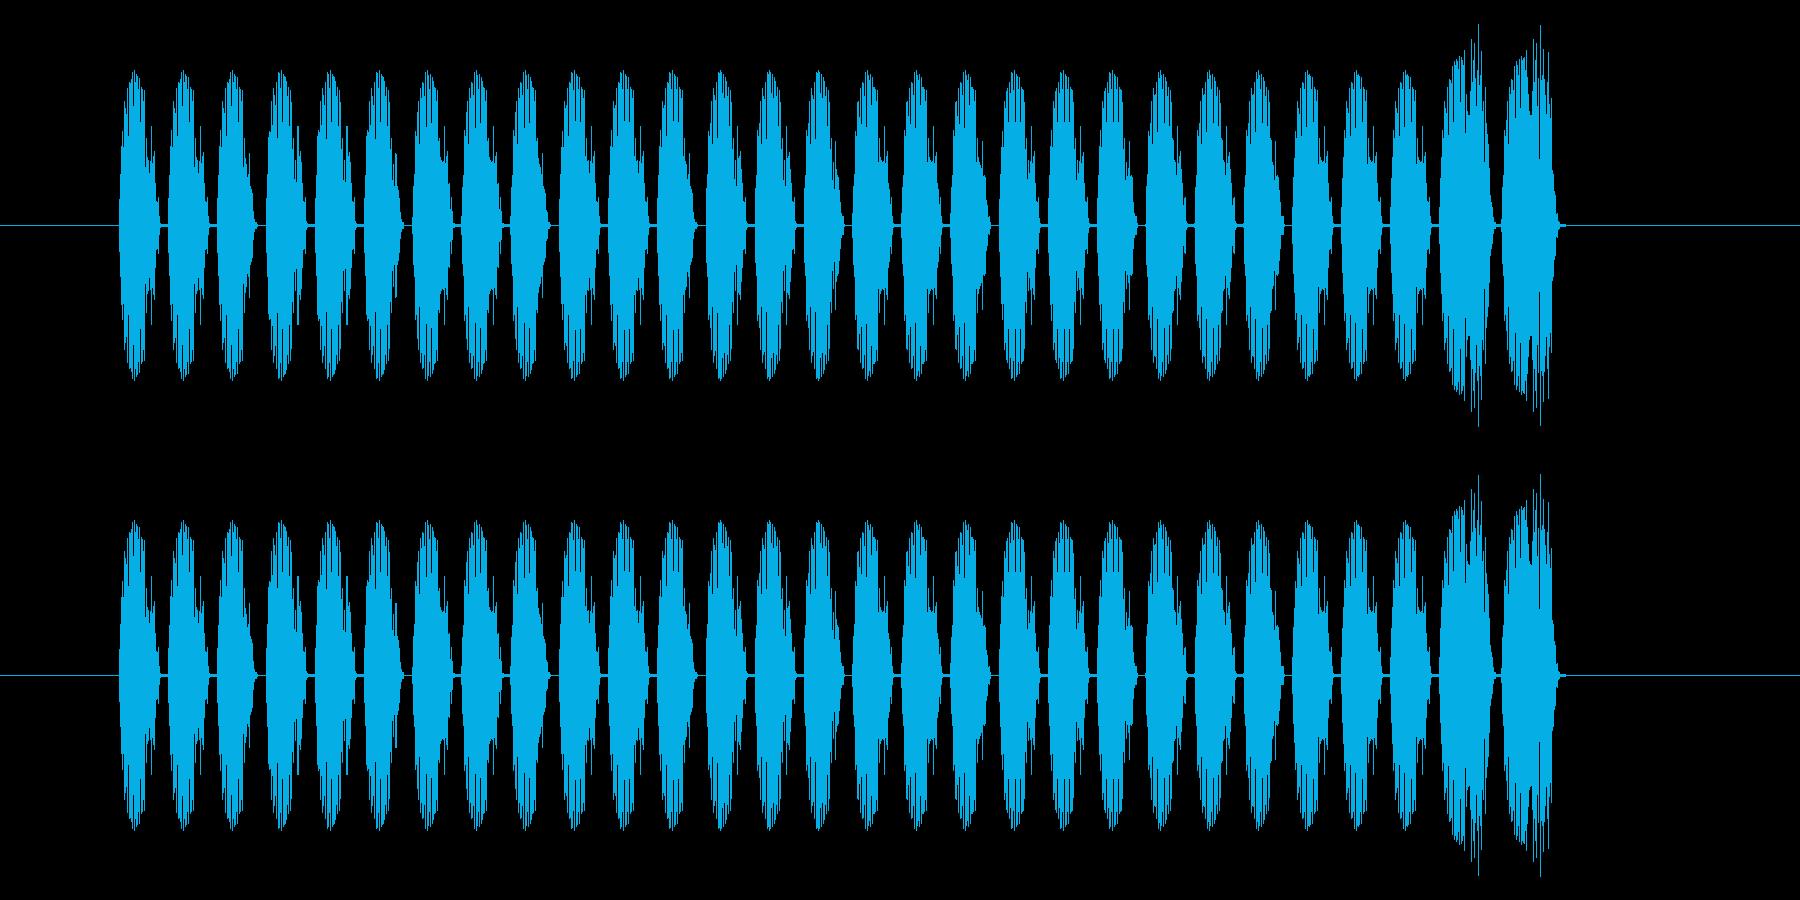 SNES 格闘06-15(スコア)の再生済みの波形